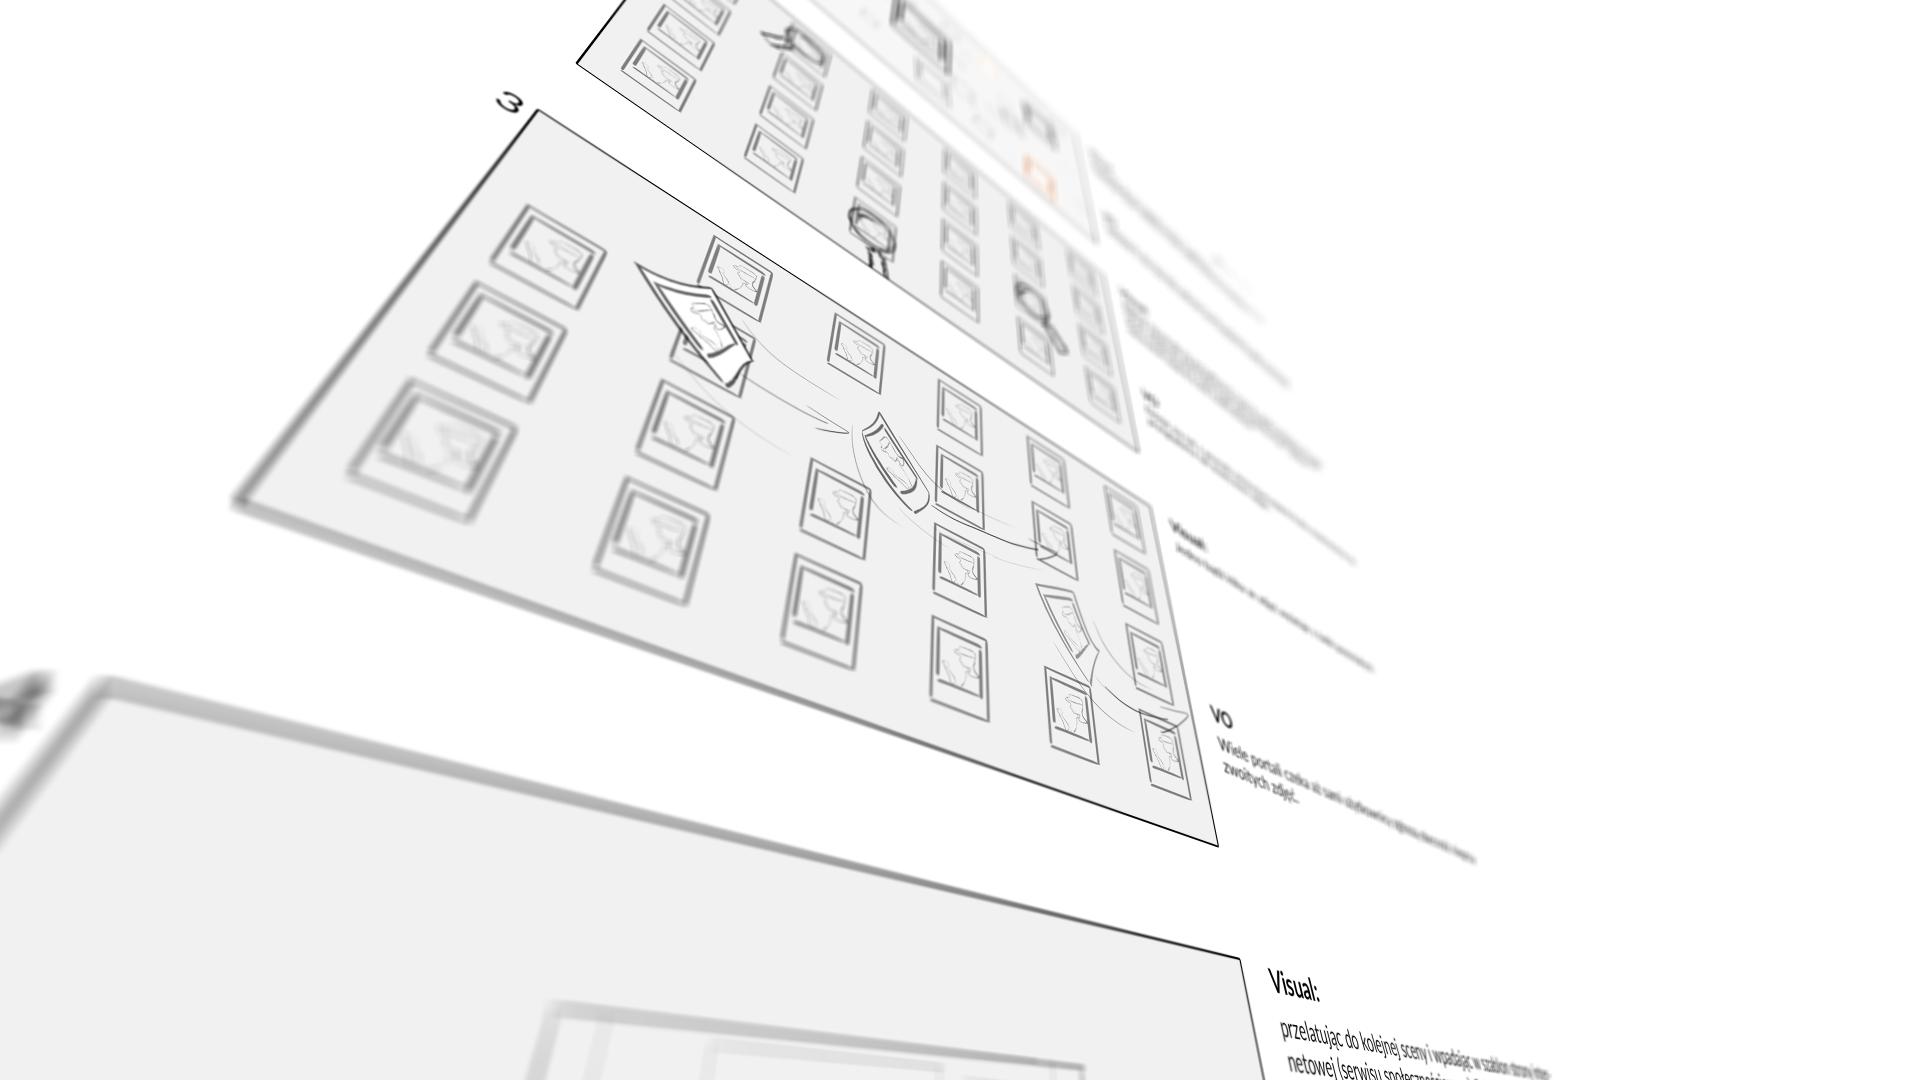 Mist Visual - Studio Animacji. Storyboard do animacji xModerator Video Explainer 2